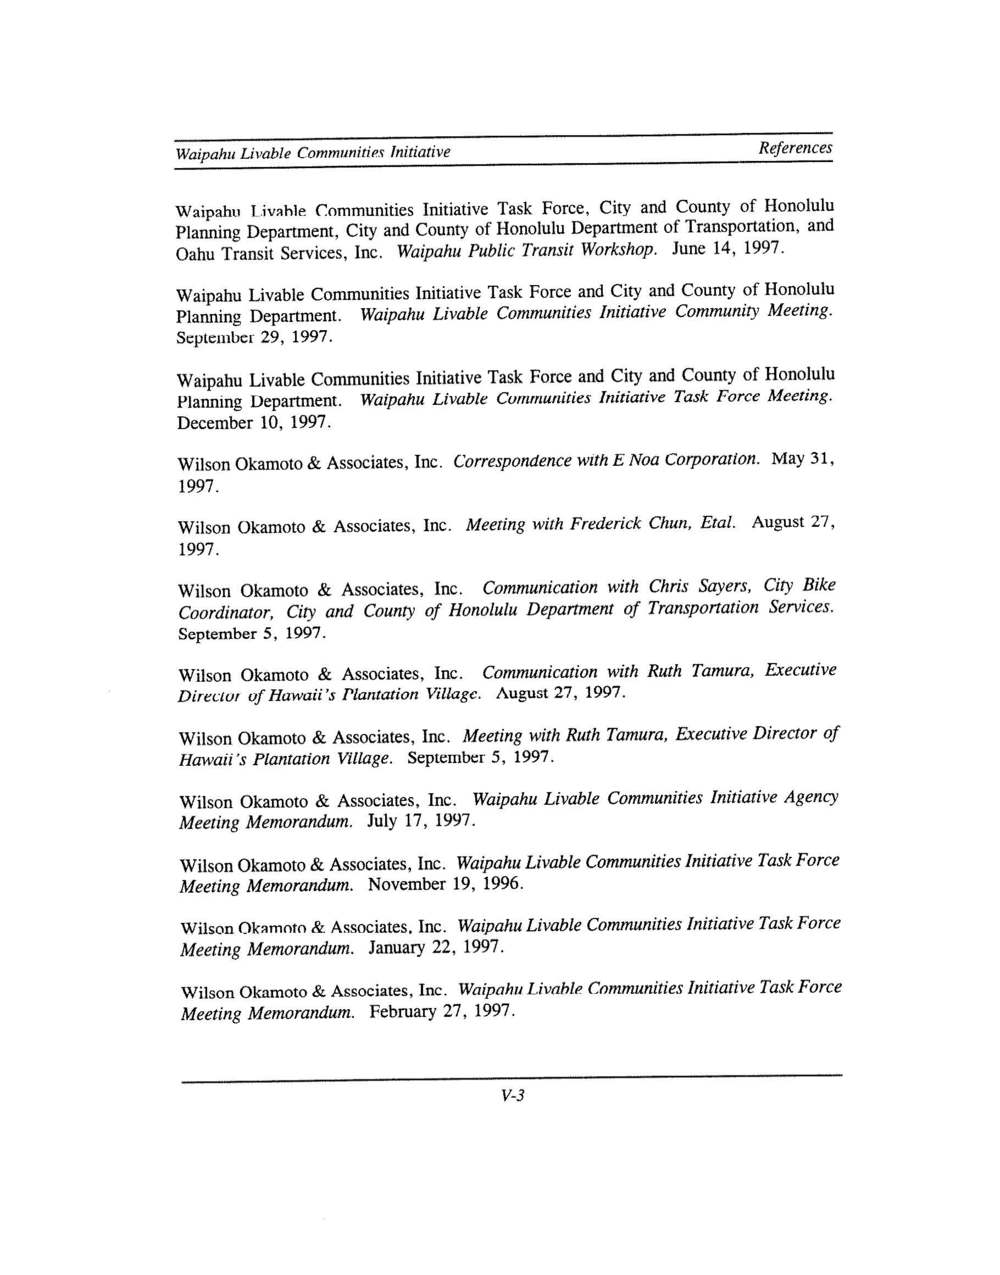 160531_WaipahuLivableCommunities(1998)_Page_156.jpg